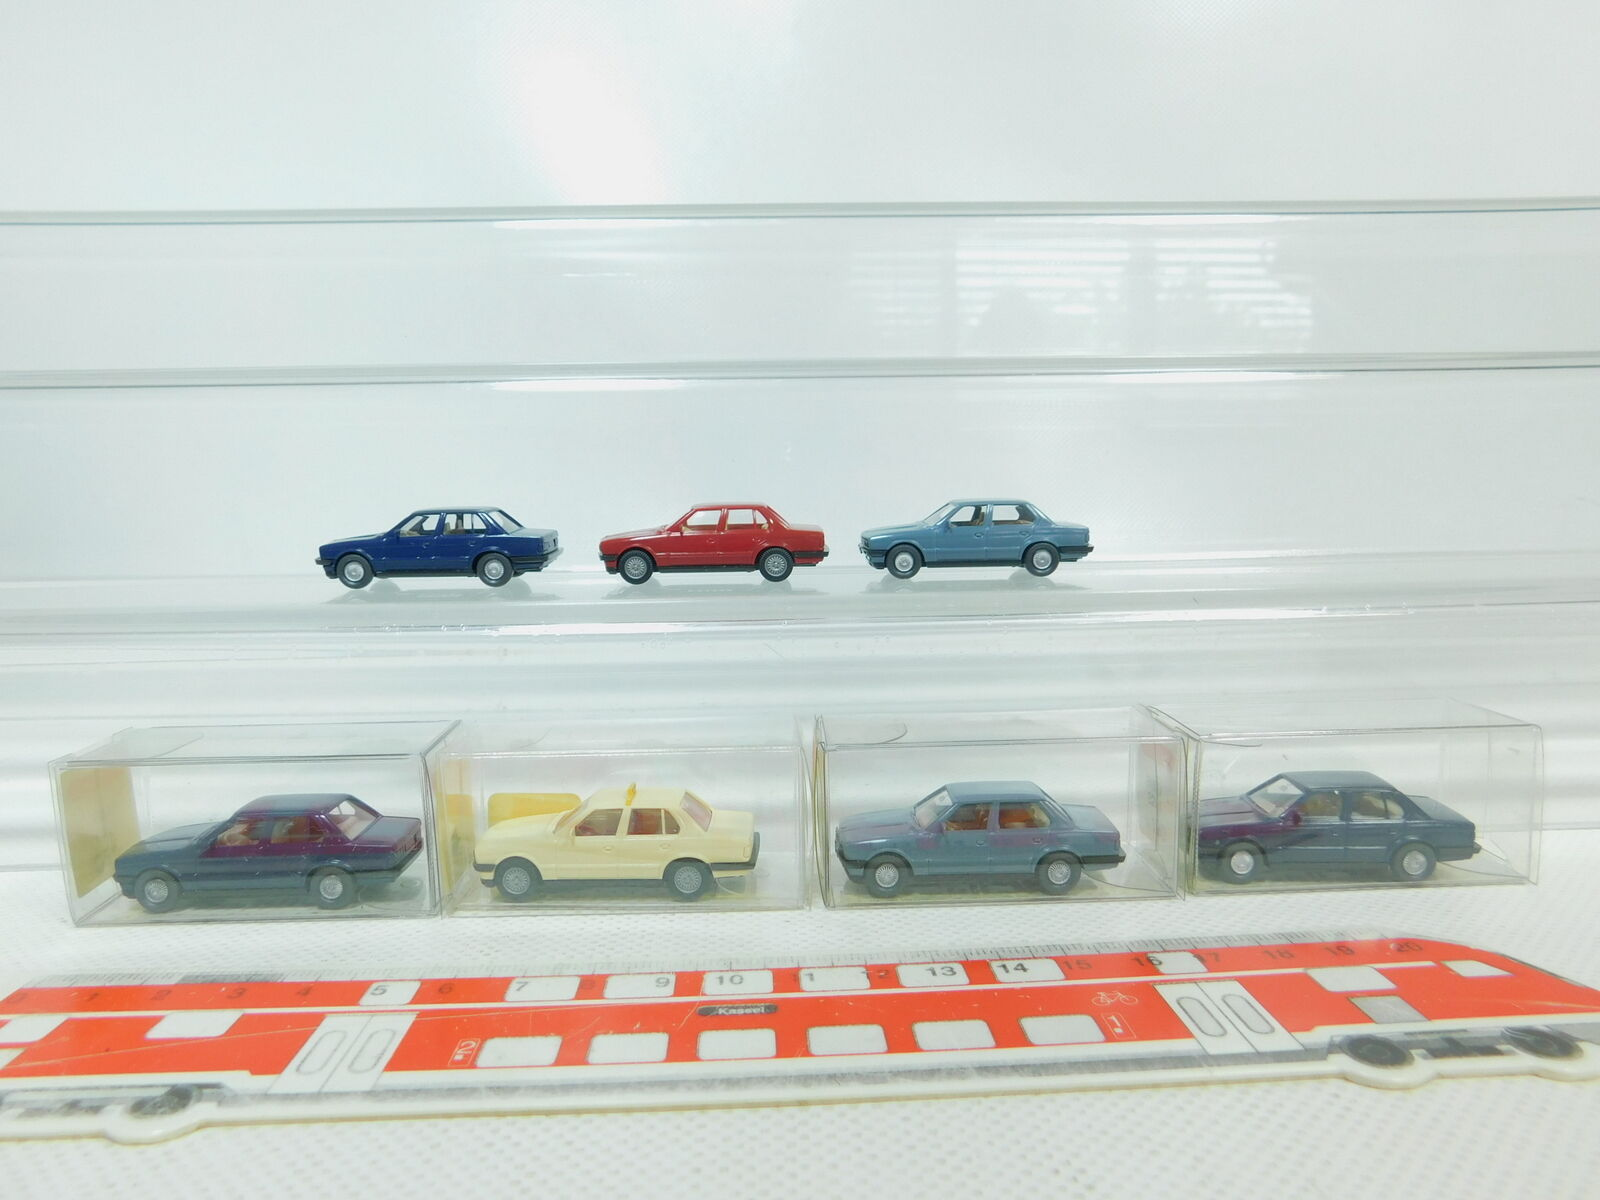 BN101-0,5  7x Wiking H0   1 87 Modèle de Voiture BMW 320i   320 I   149